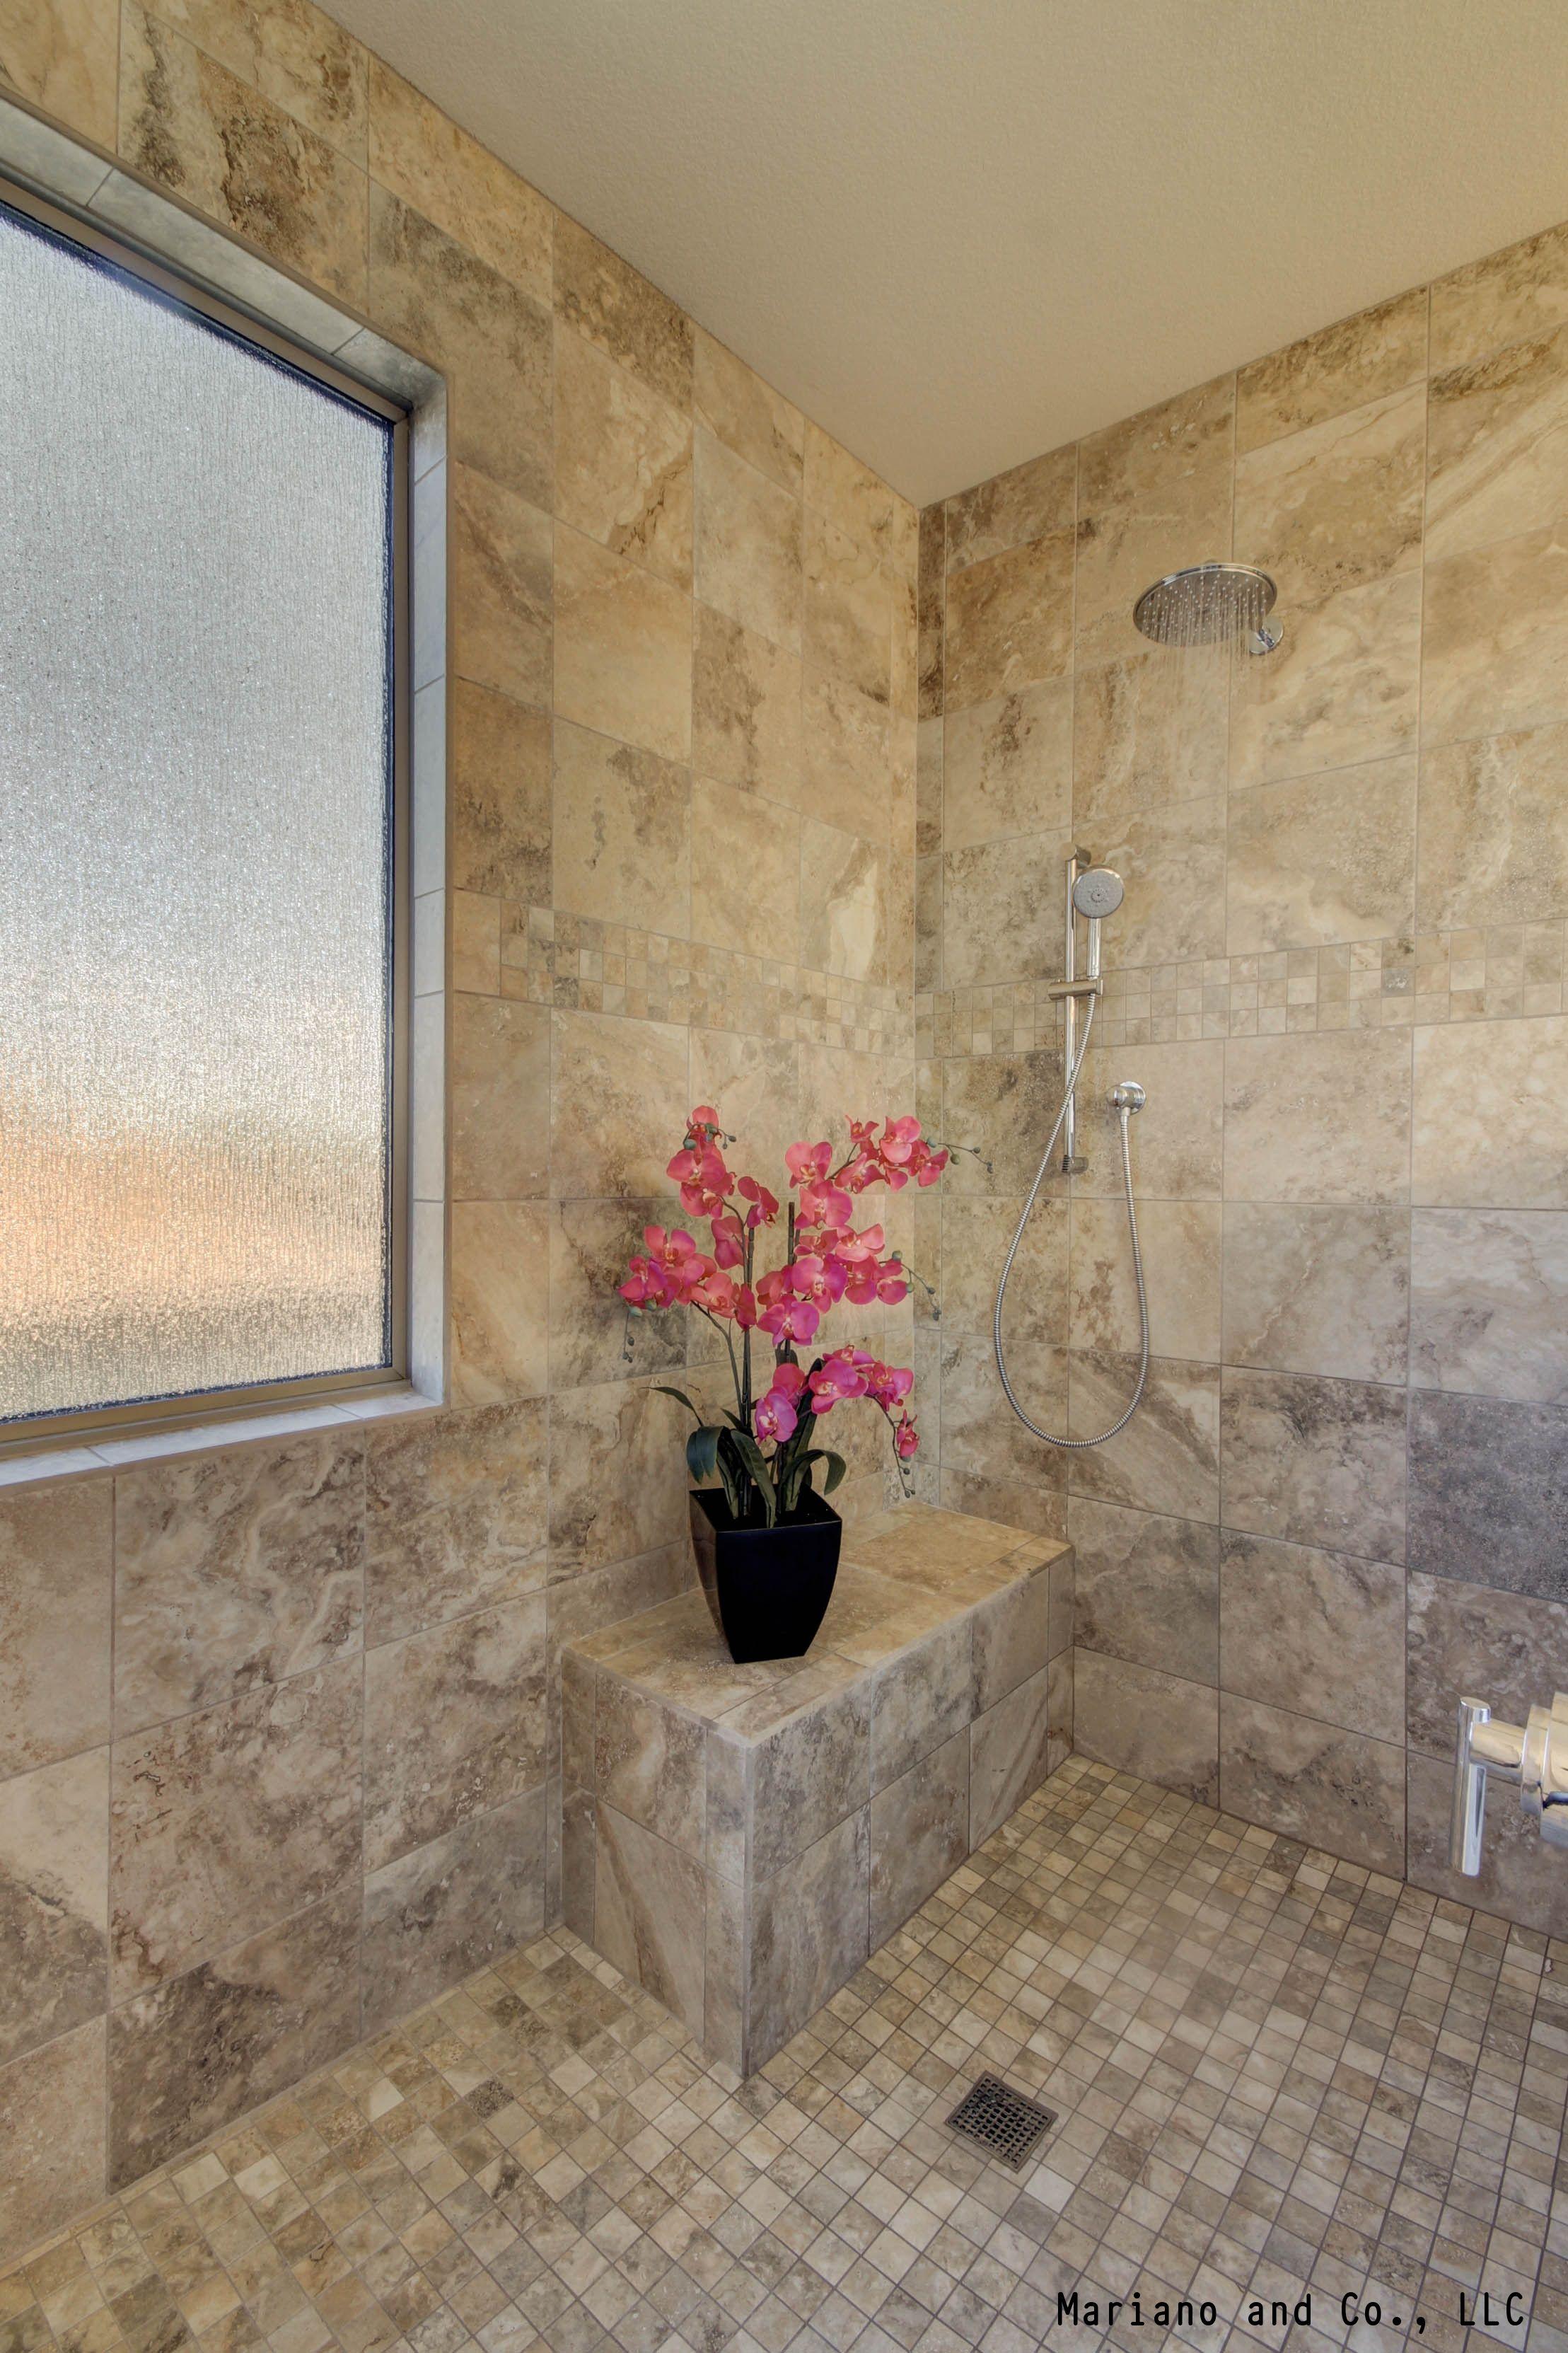 Shower Installation Cost Guide Shower Doors Tiles Pumps Etc Walk In Shower Shower Installation Shower Bench Built In